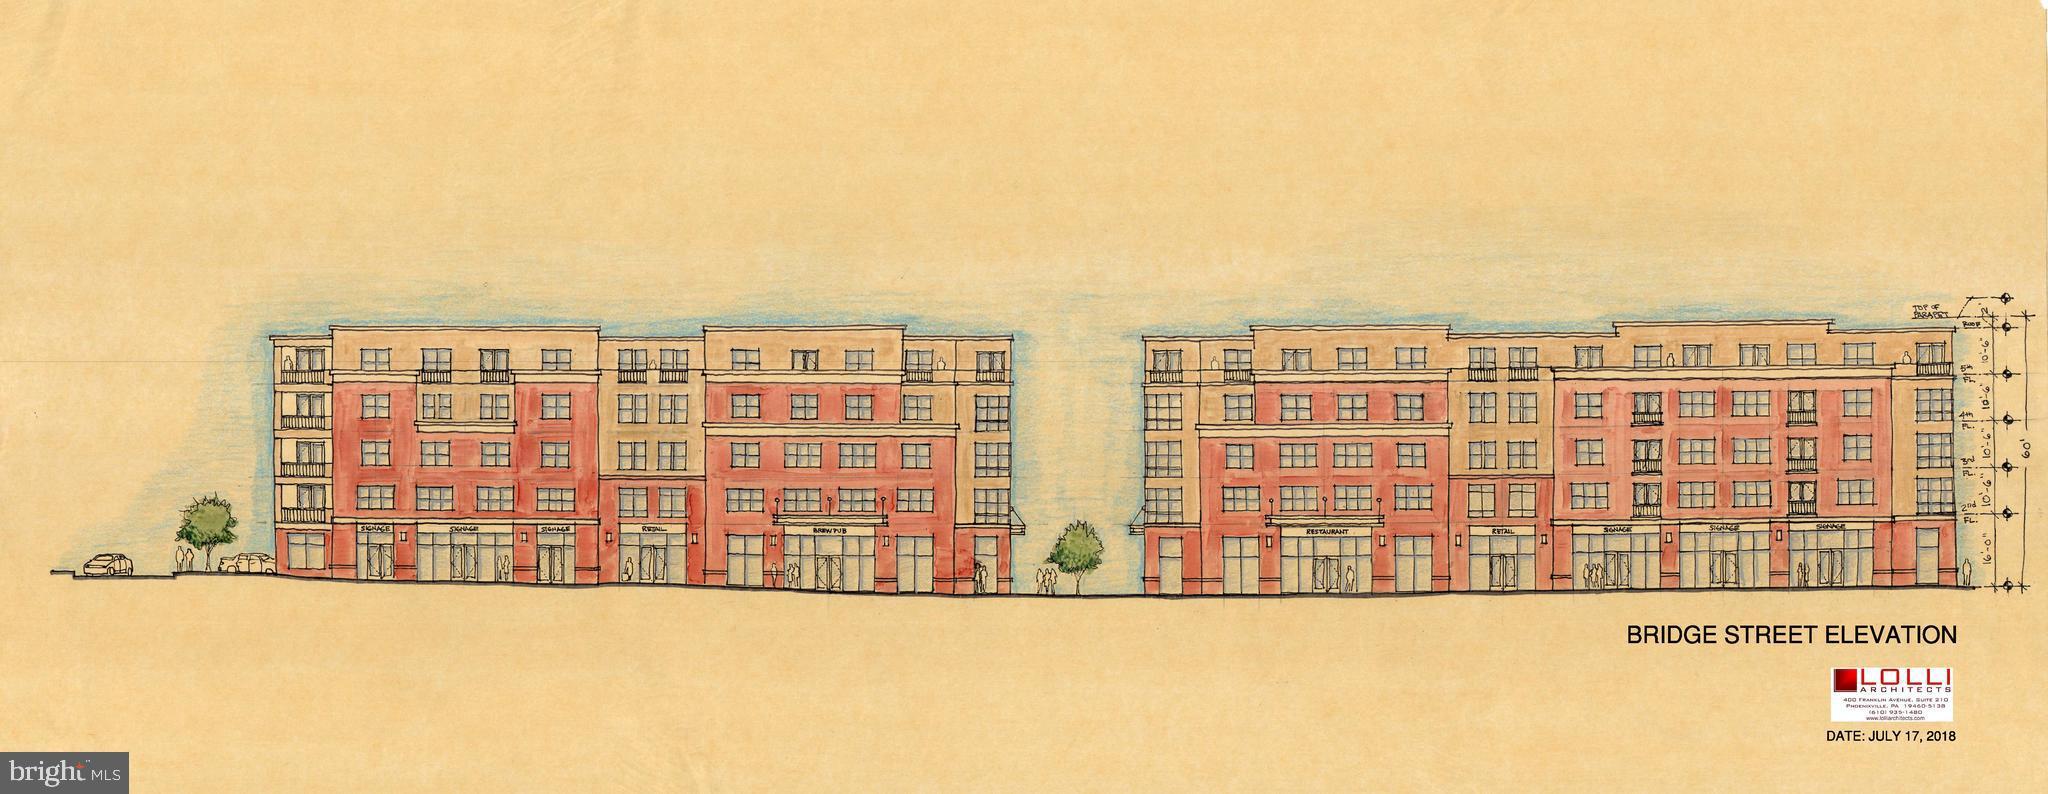 370 BRIDGE STREET, PHOENIXVILLE, PA 19460